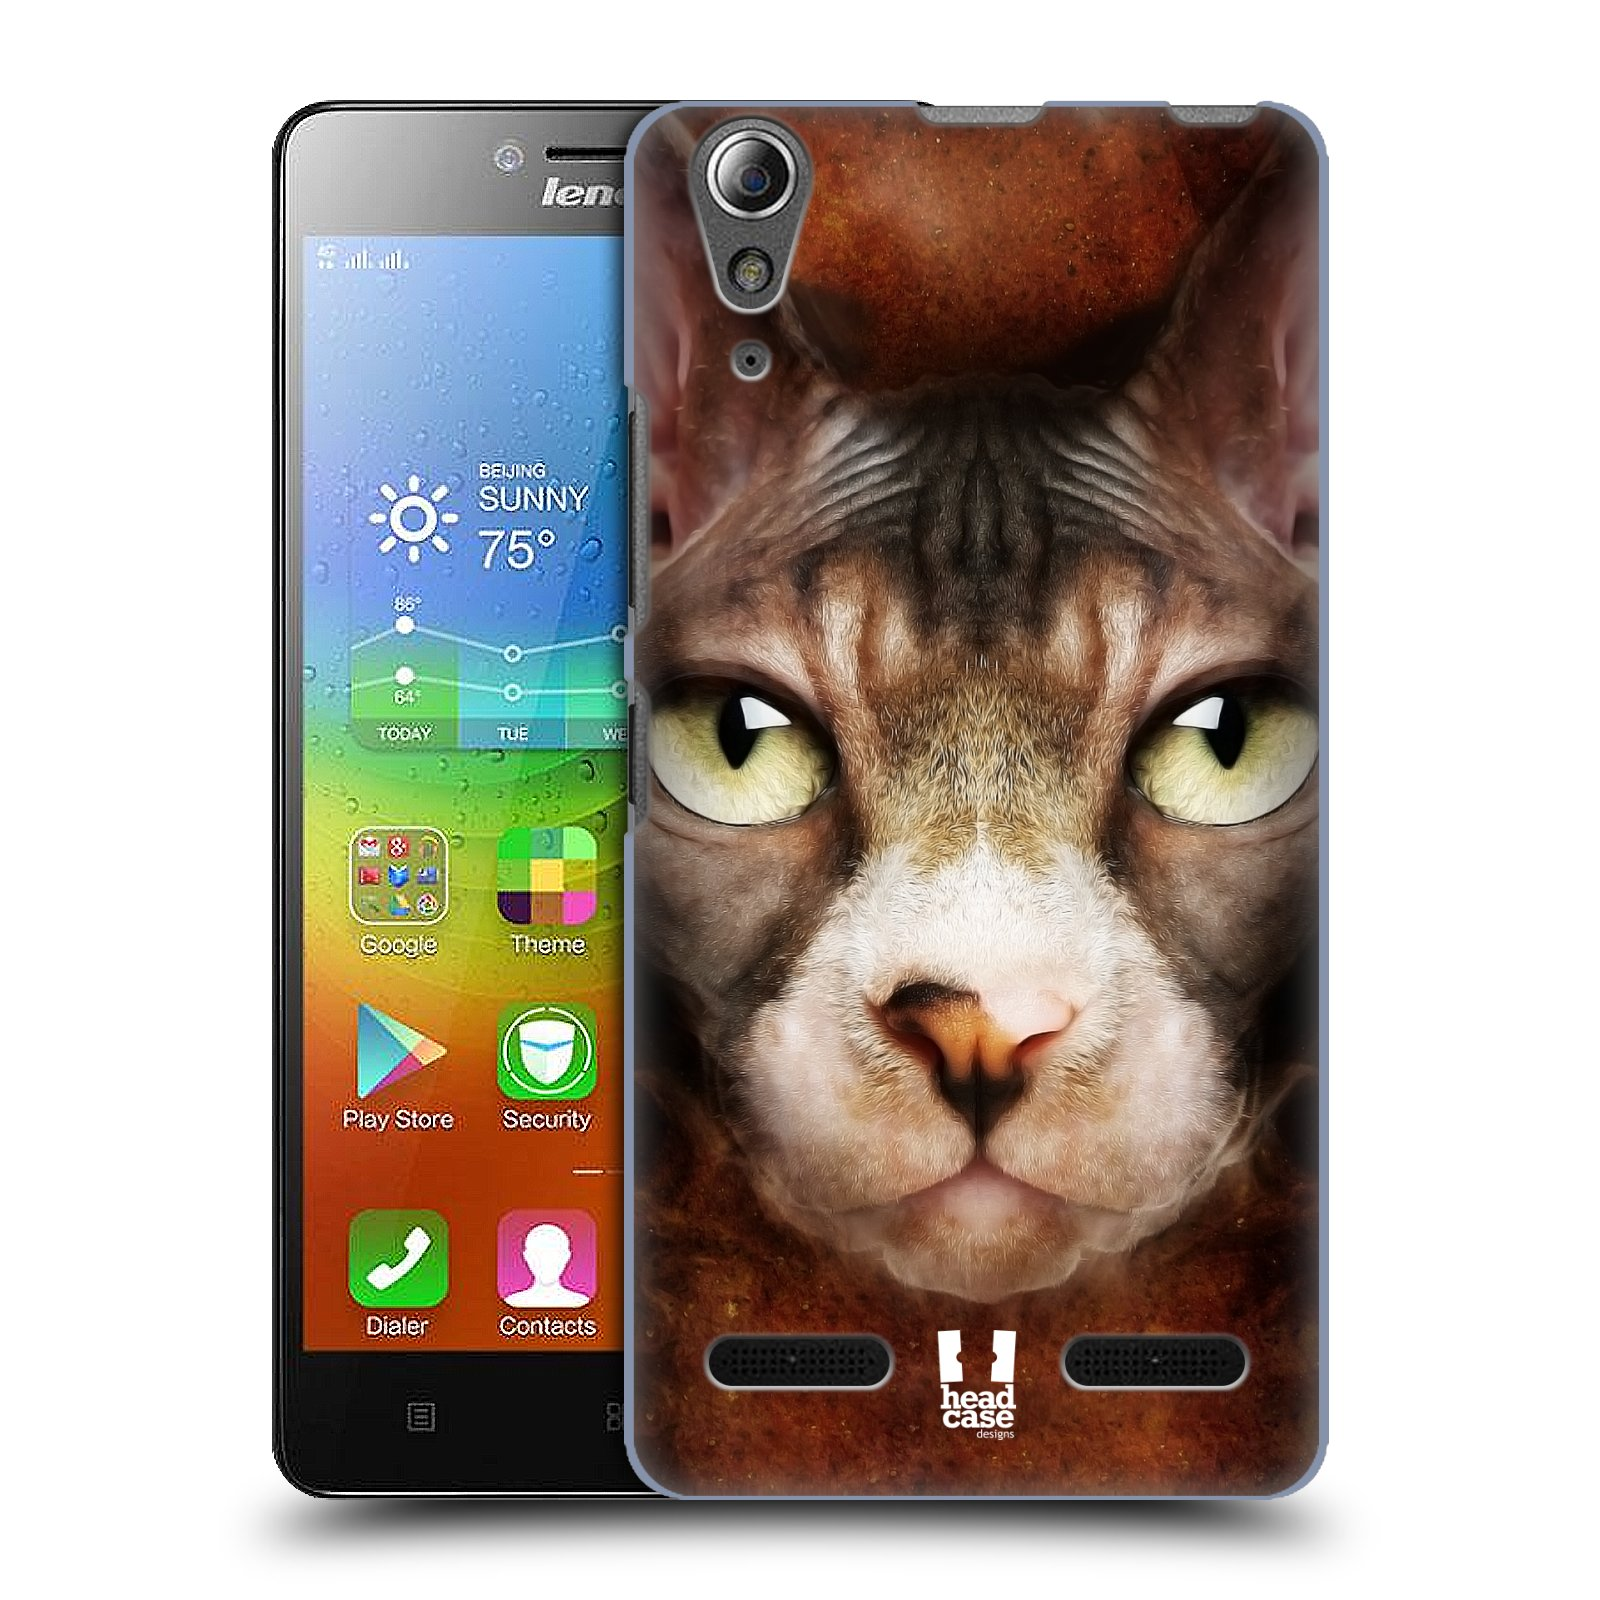 HEAD CASE pevný plastový obal na mobil LENOVO A6000 / A6000 PLUS vzor Zvířecí tváře kočka sphynx